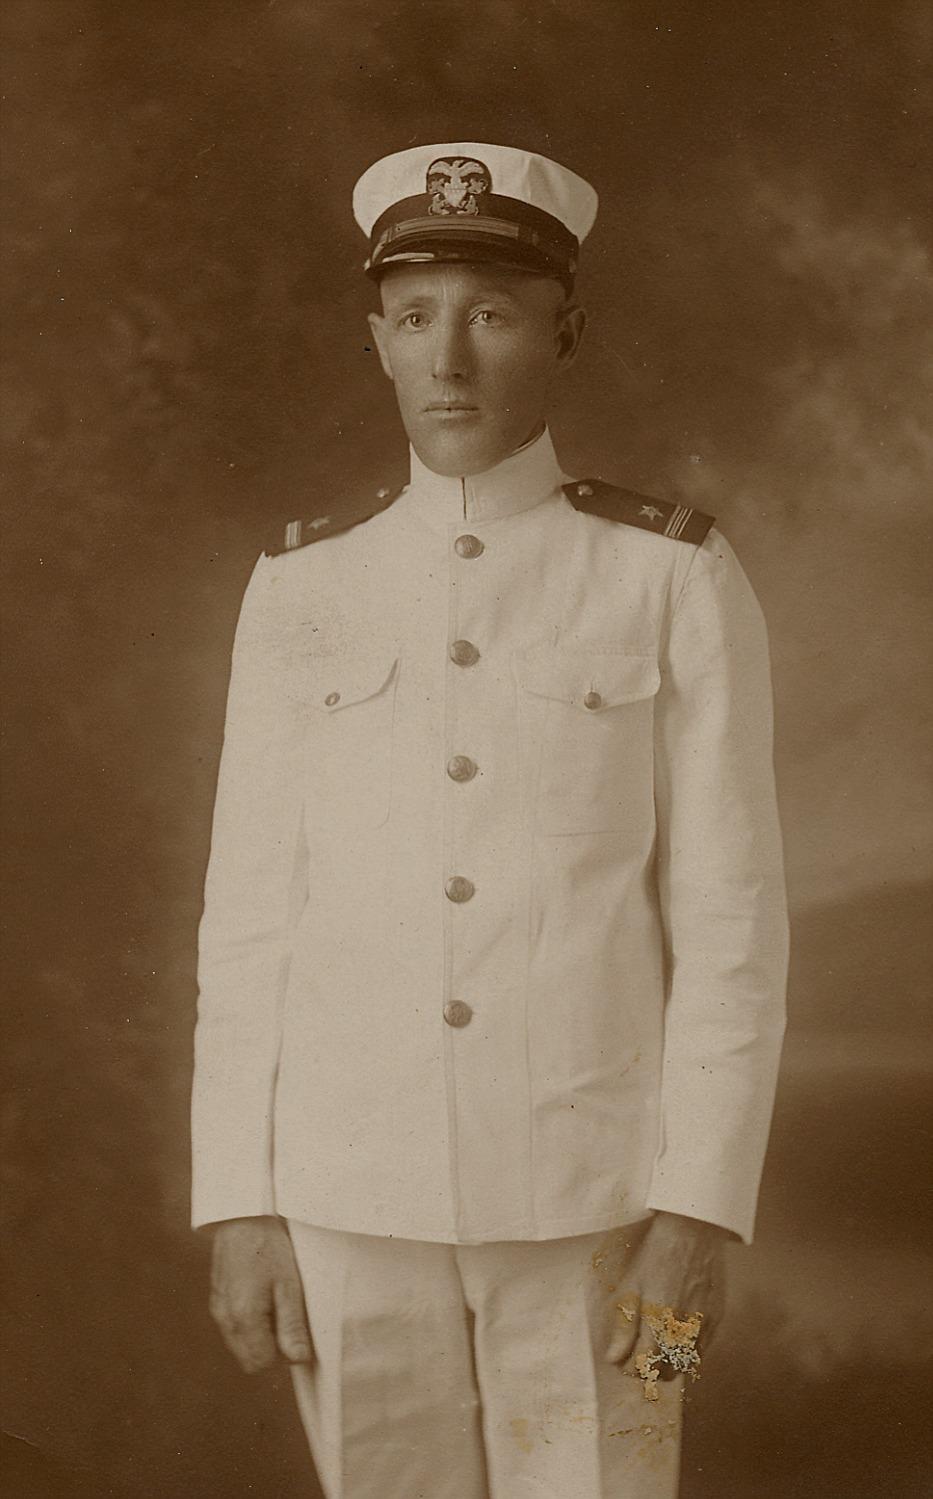 Kapten Nelson i USA Navy 1914-1918.